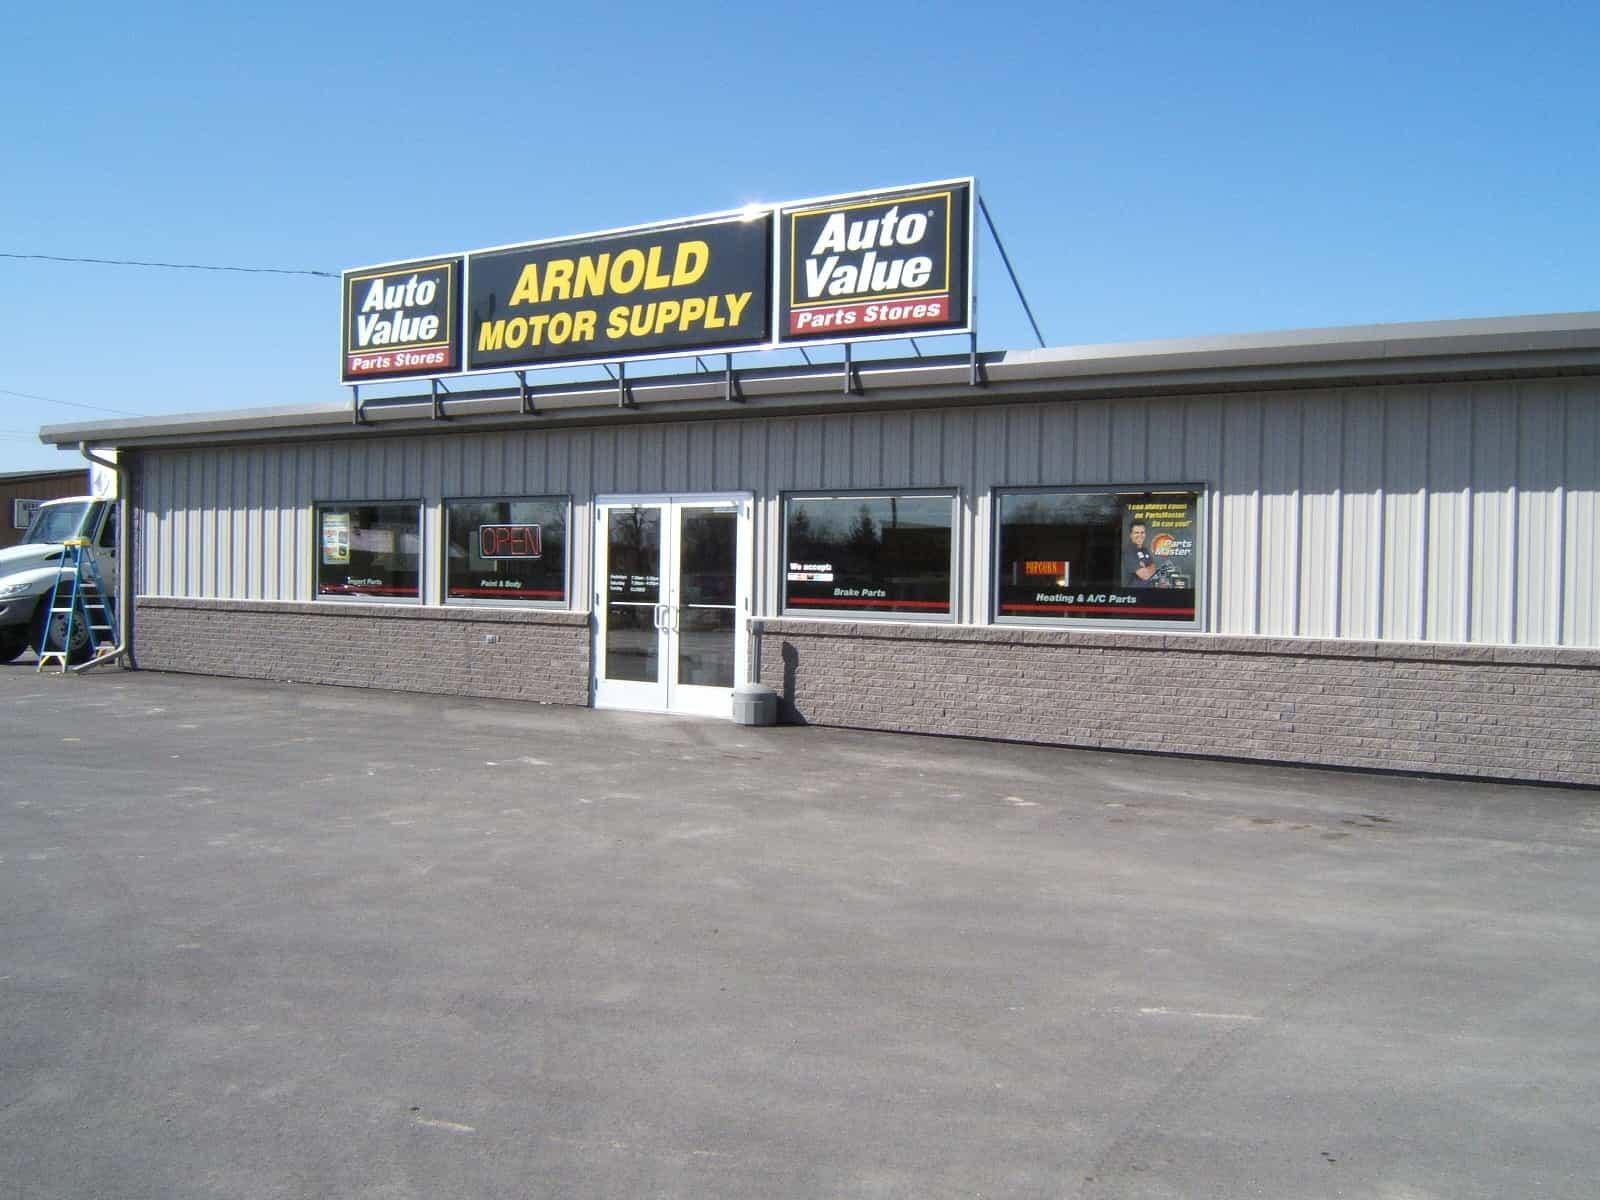 Webster City Iowa Parts Store